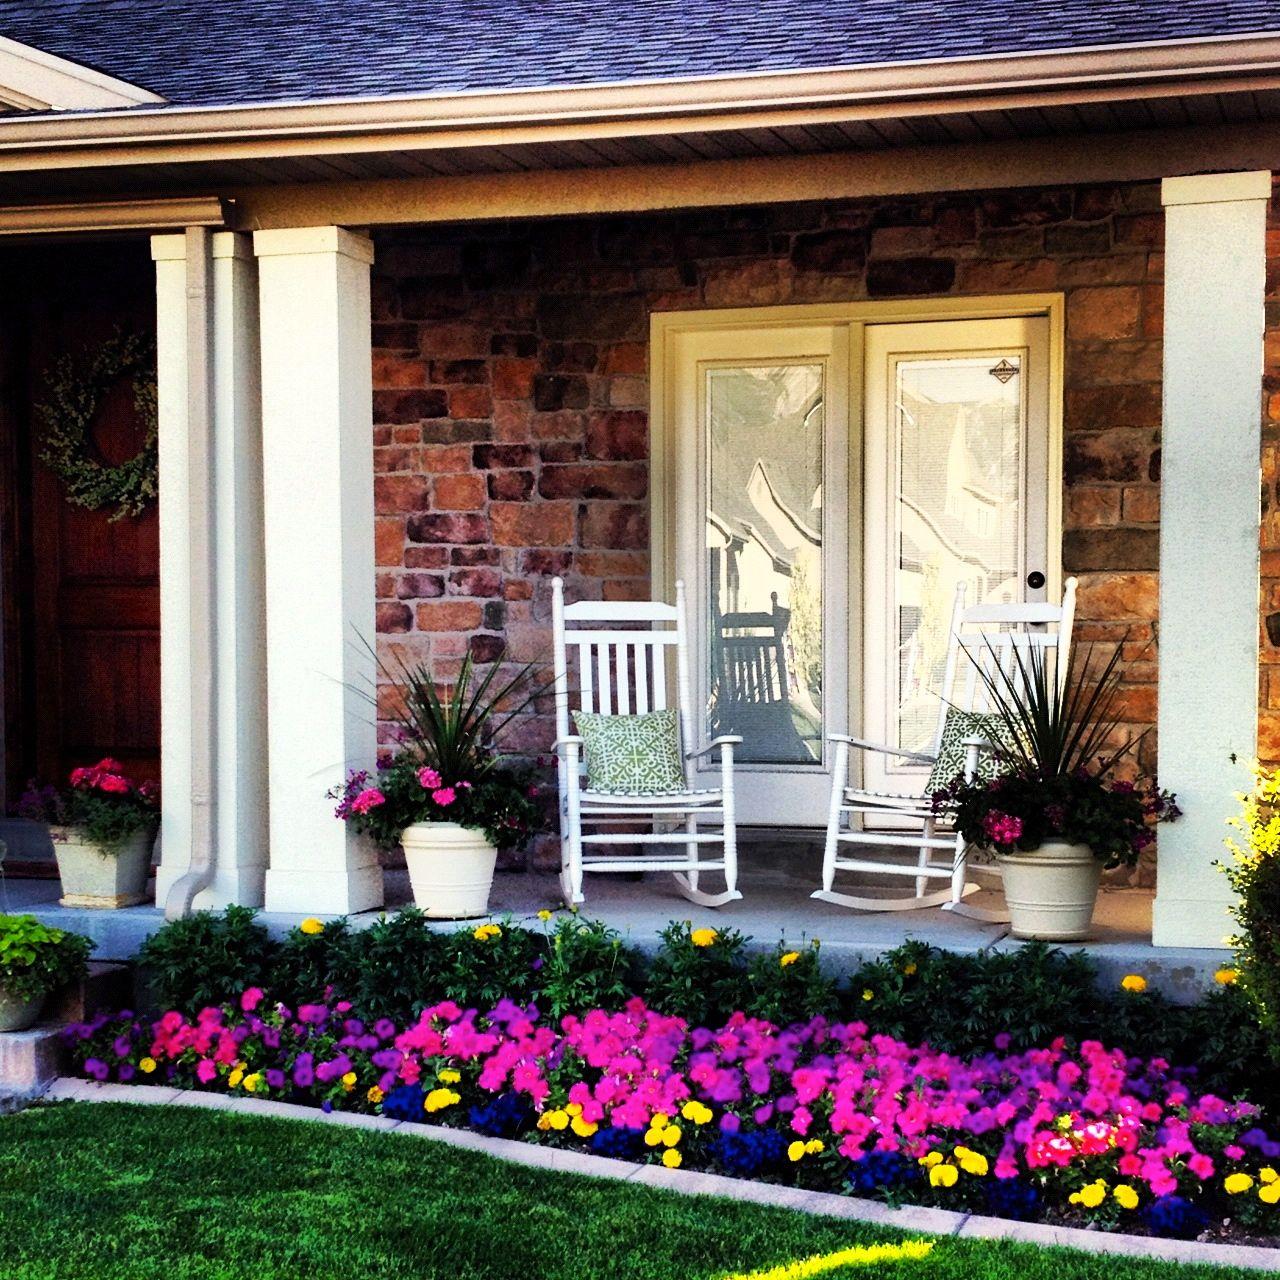 Lawn Begone 7 Ideas For Front Garden Landscapes: Small Backyard Gardens, Garden